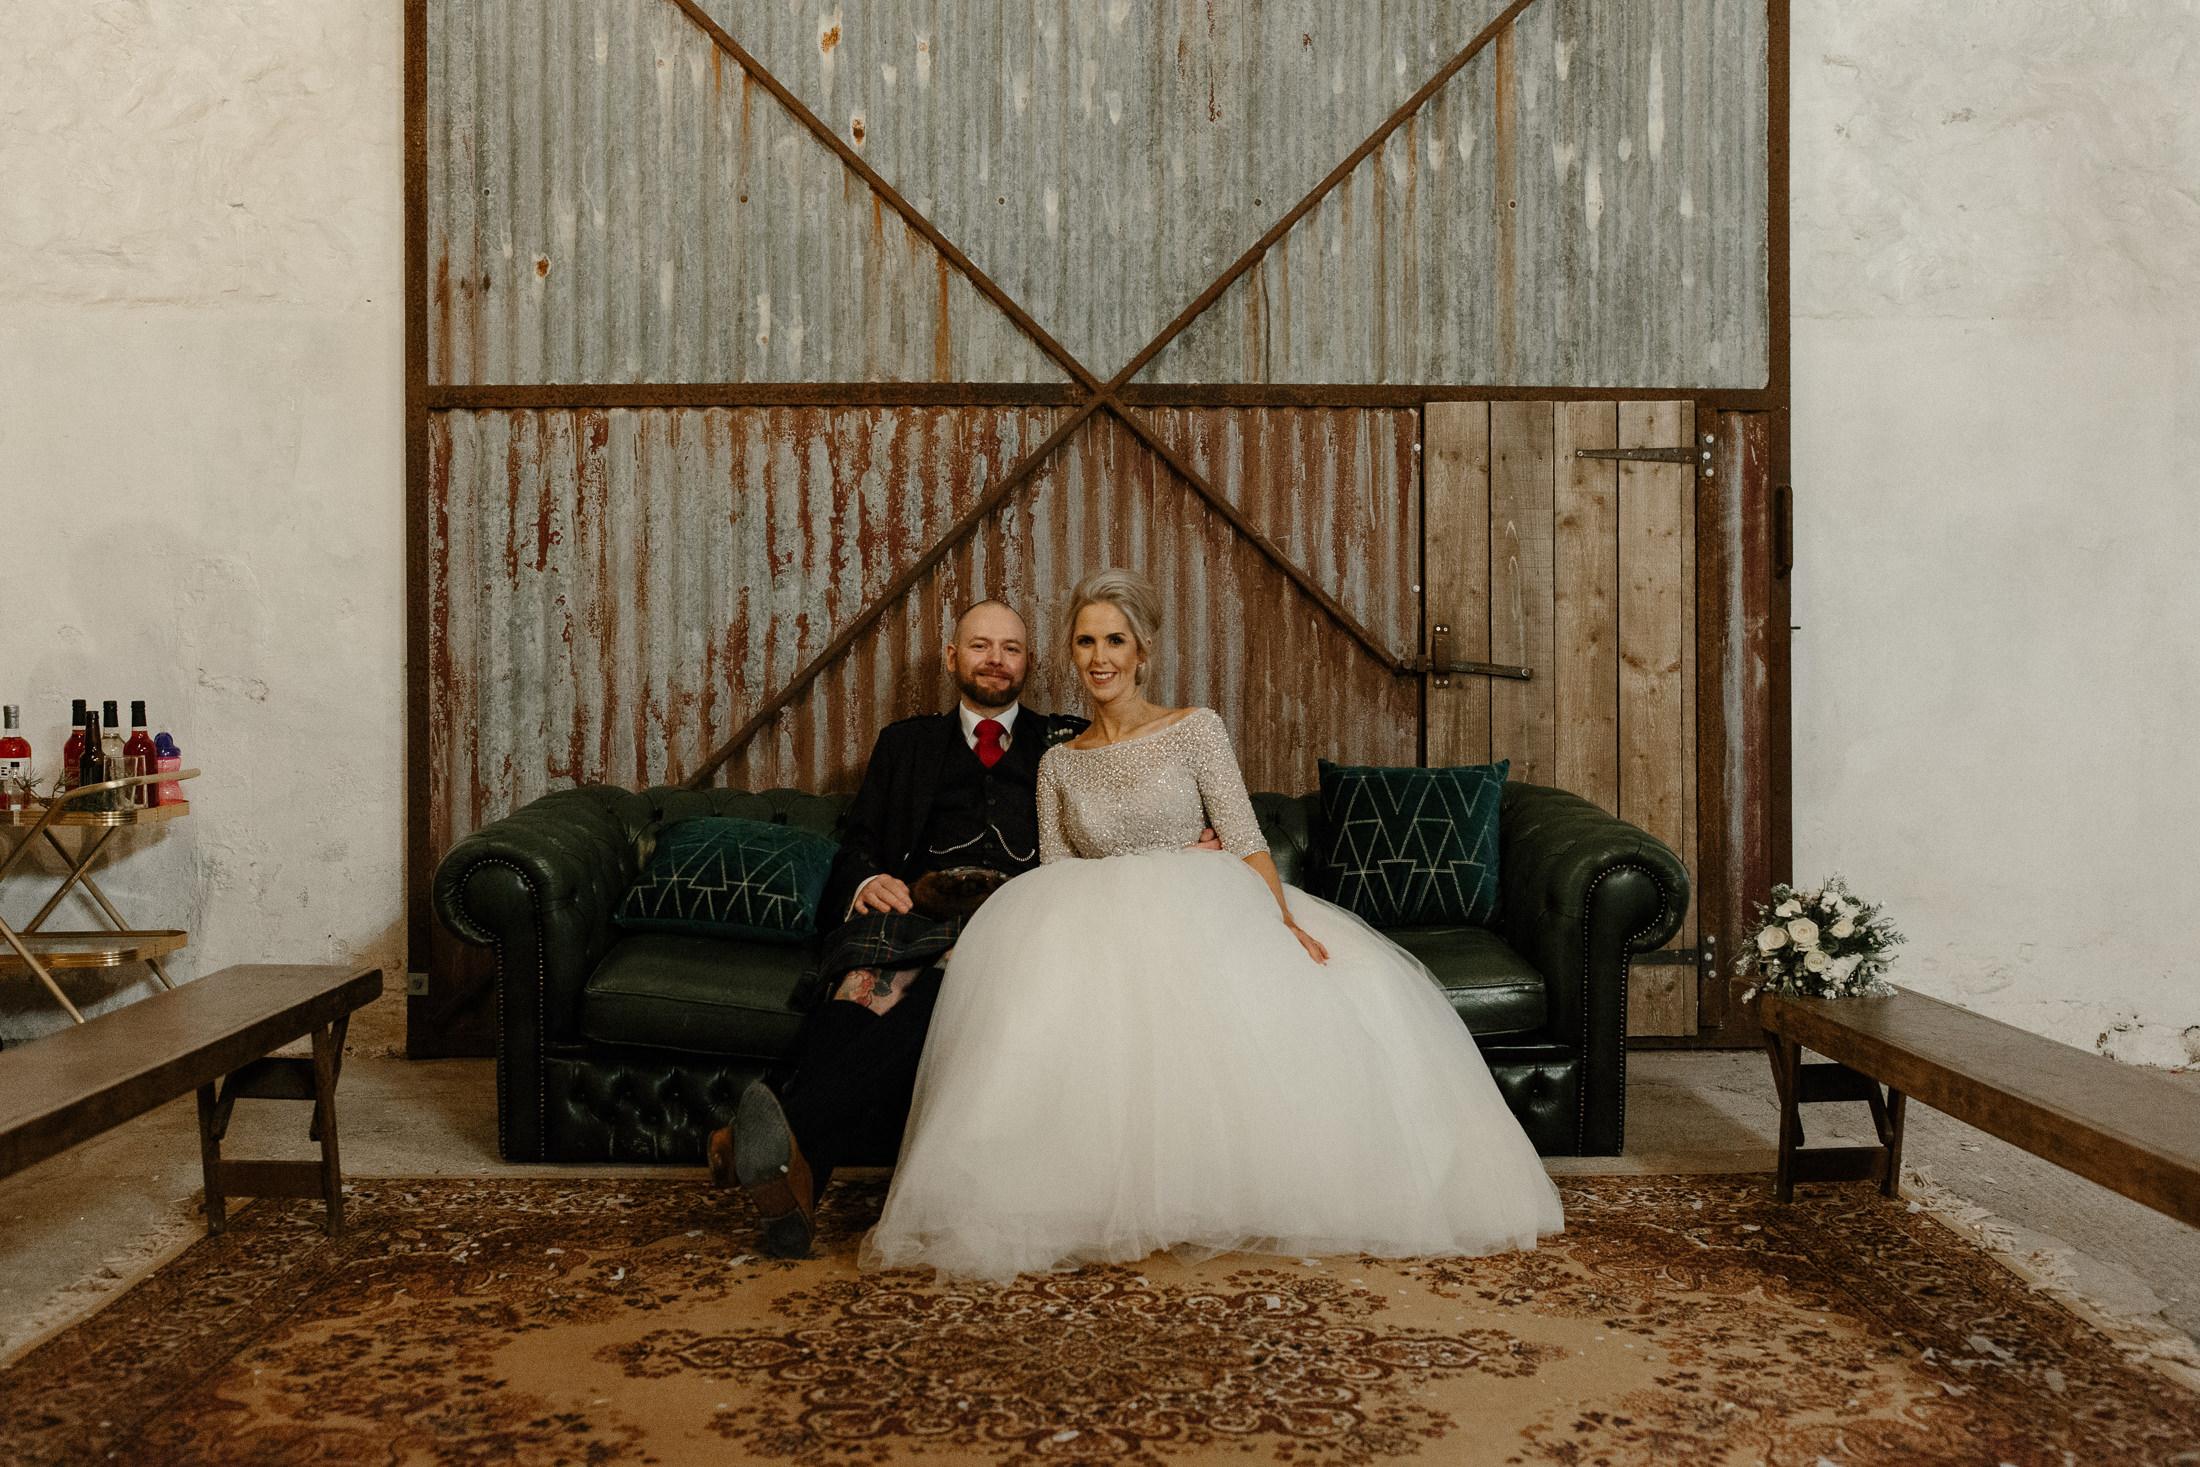 Kayleigh-Michael-Cow-Shed-Cowshed-Crail-Fife-Coastal-Rustic-Barn-Lianne-Mackay-Wedding-Photography-Photographer-Edinburgh-Glasgow-Scotland-WEB-RES-571.jpg